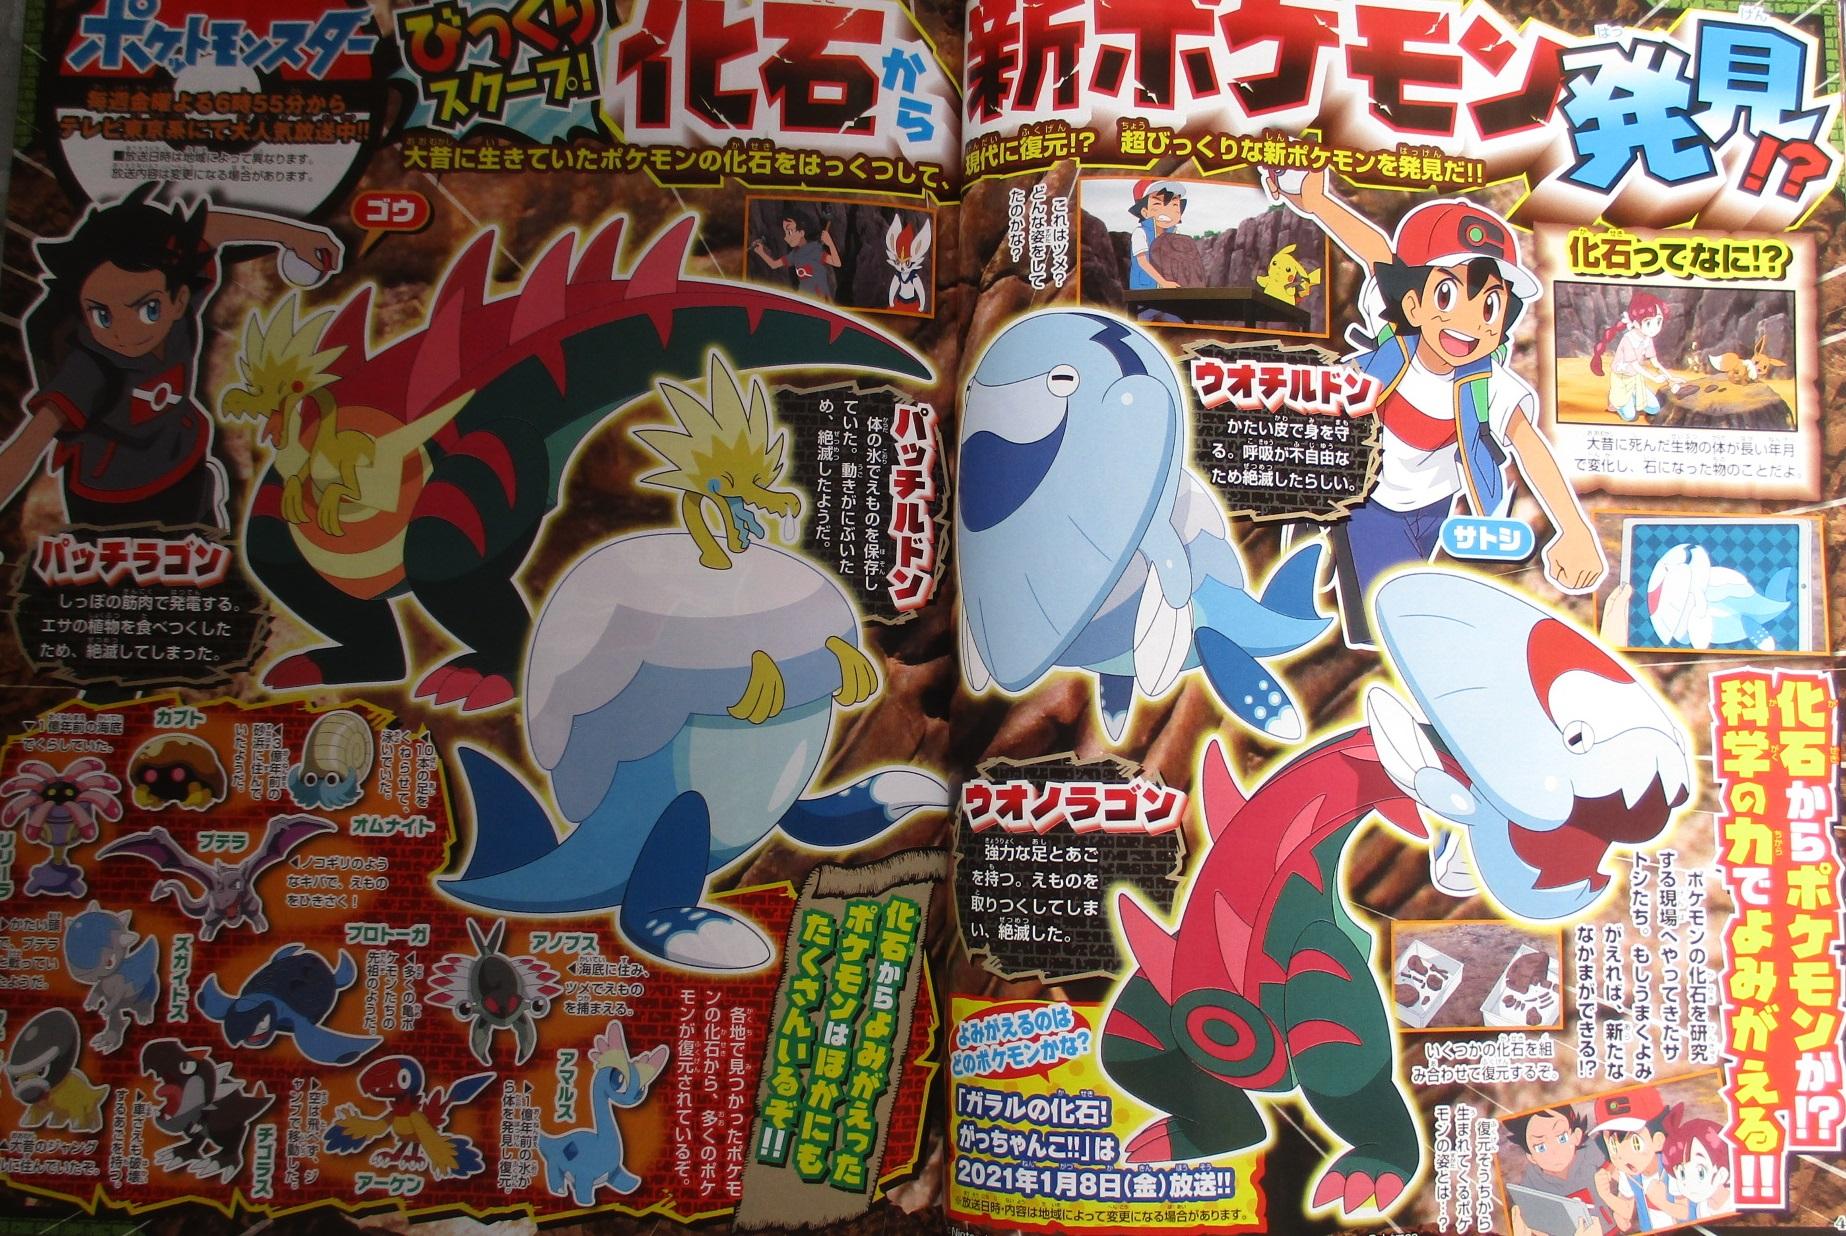 Viajes Pokémon Capítulo 50